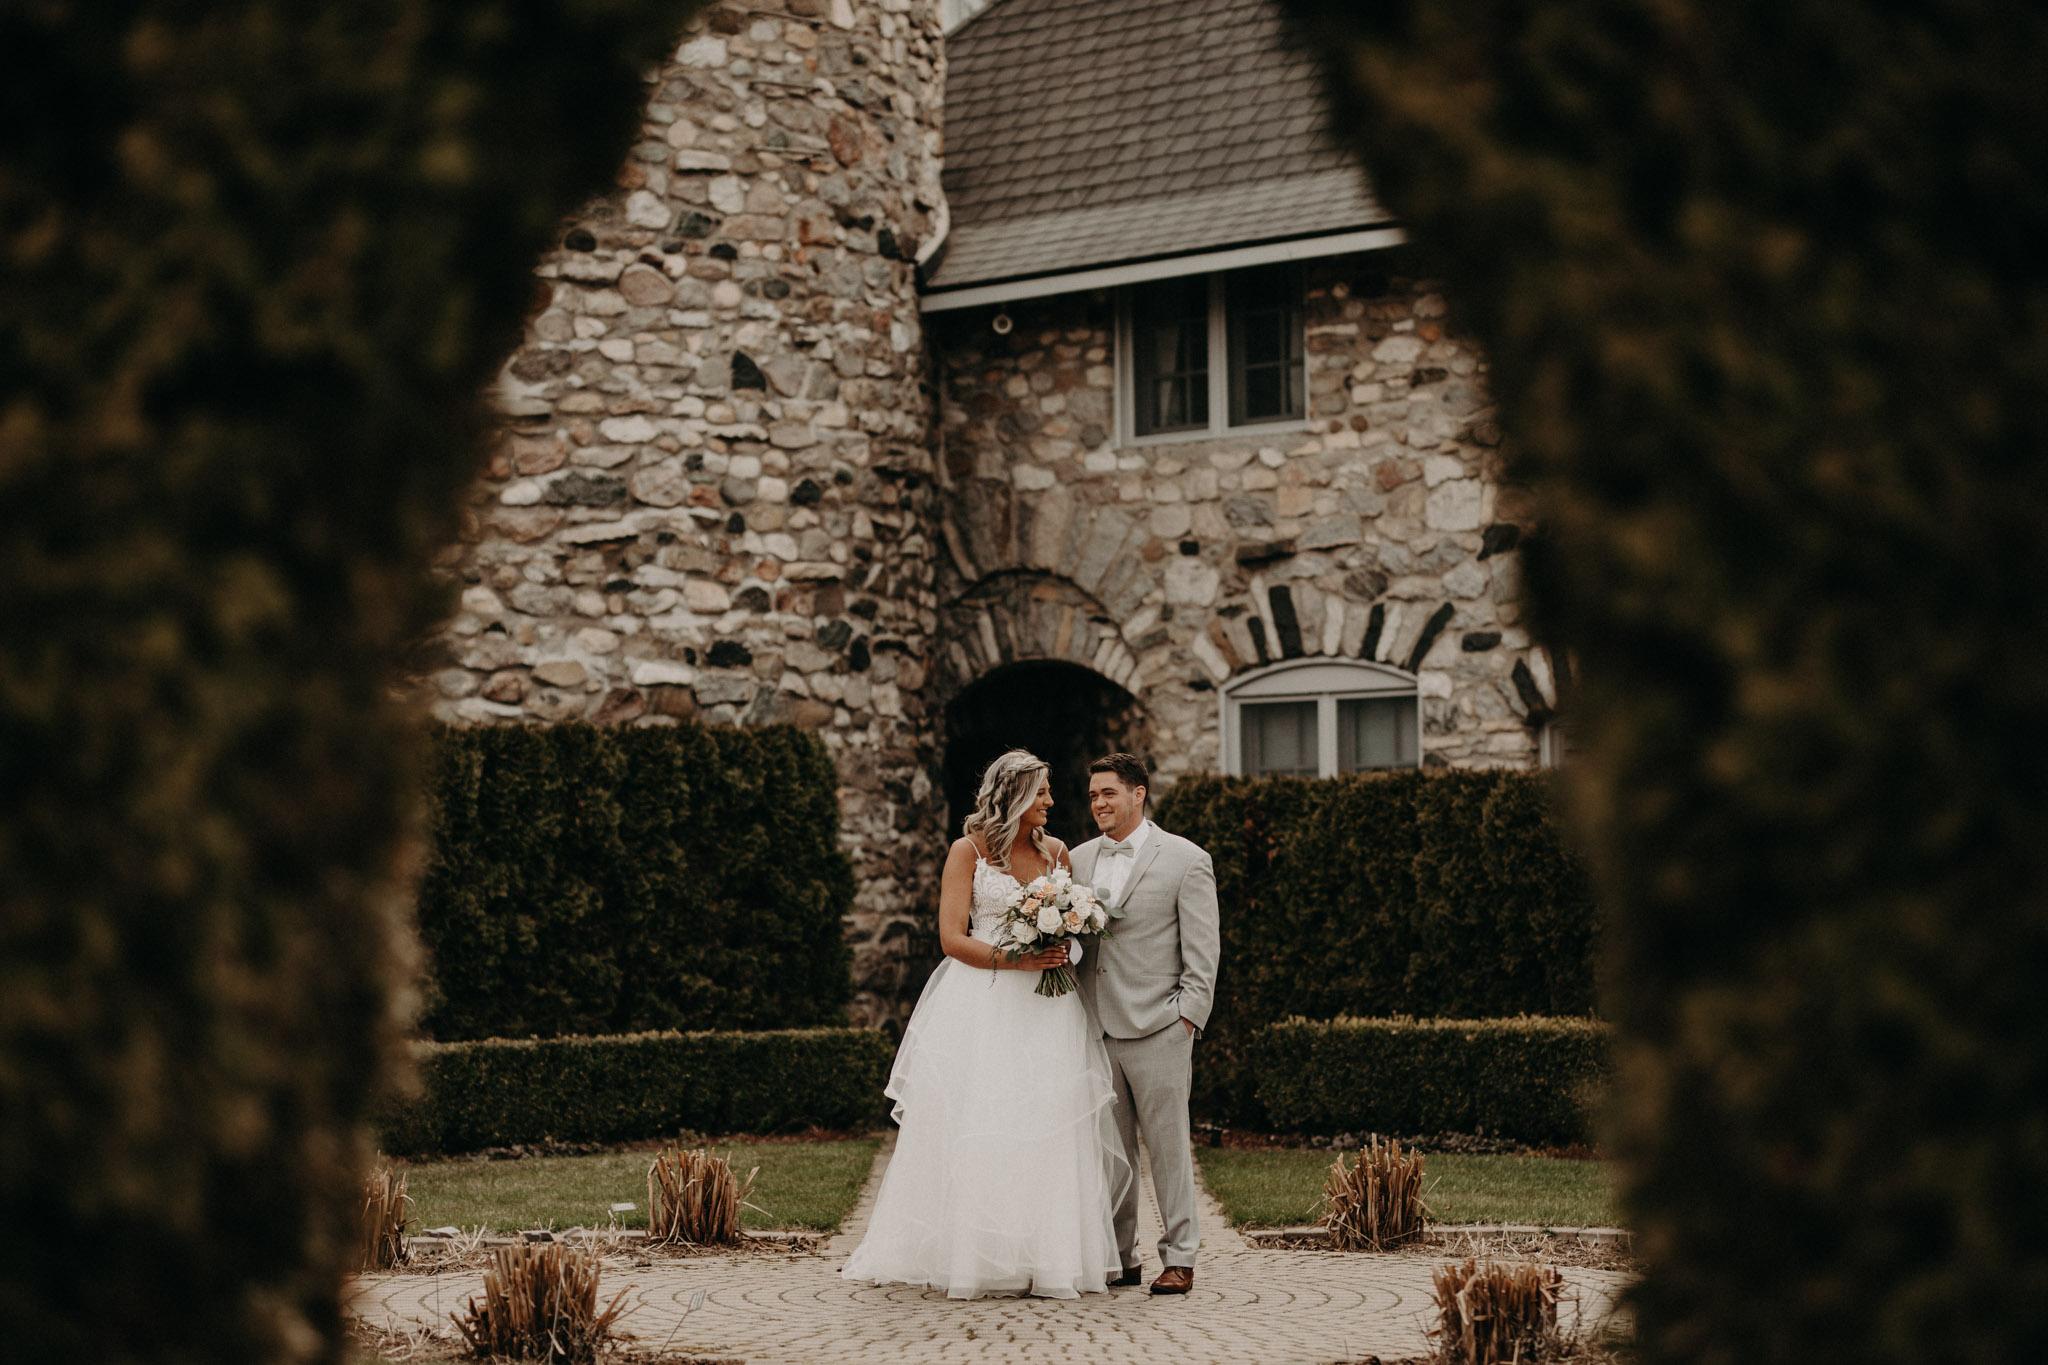 Castle-Farms-Lake-Charlevoix-Wedding-45.jpg